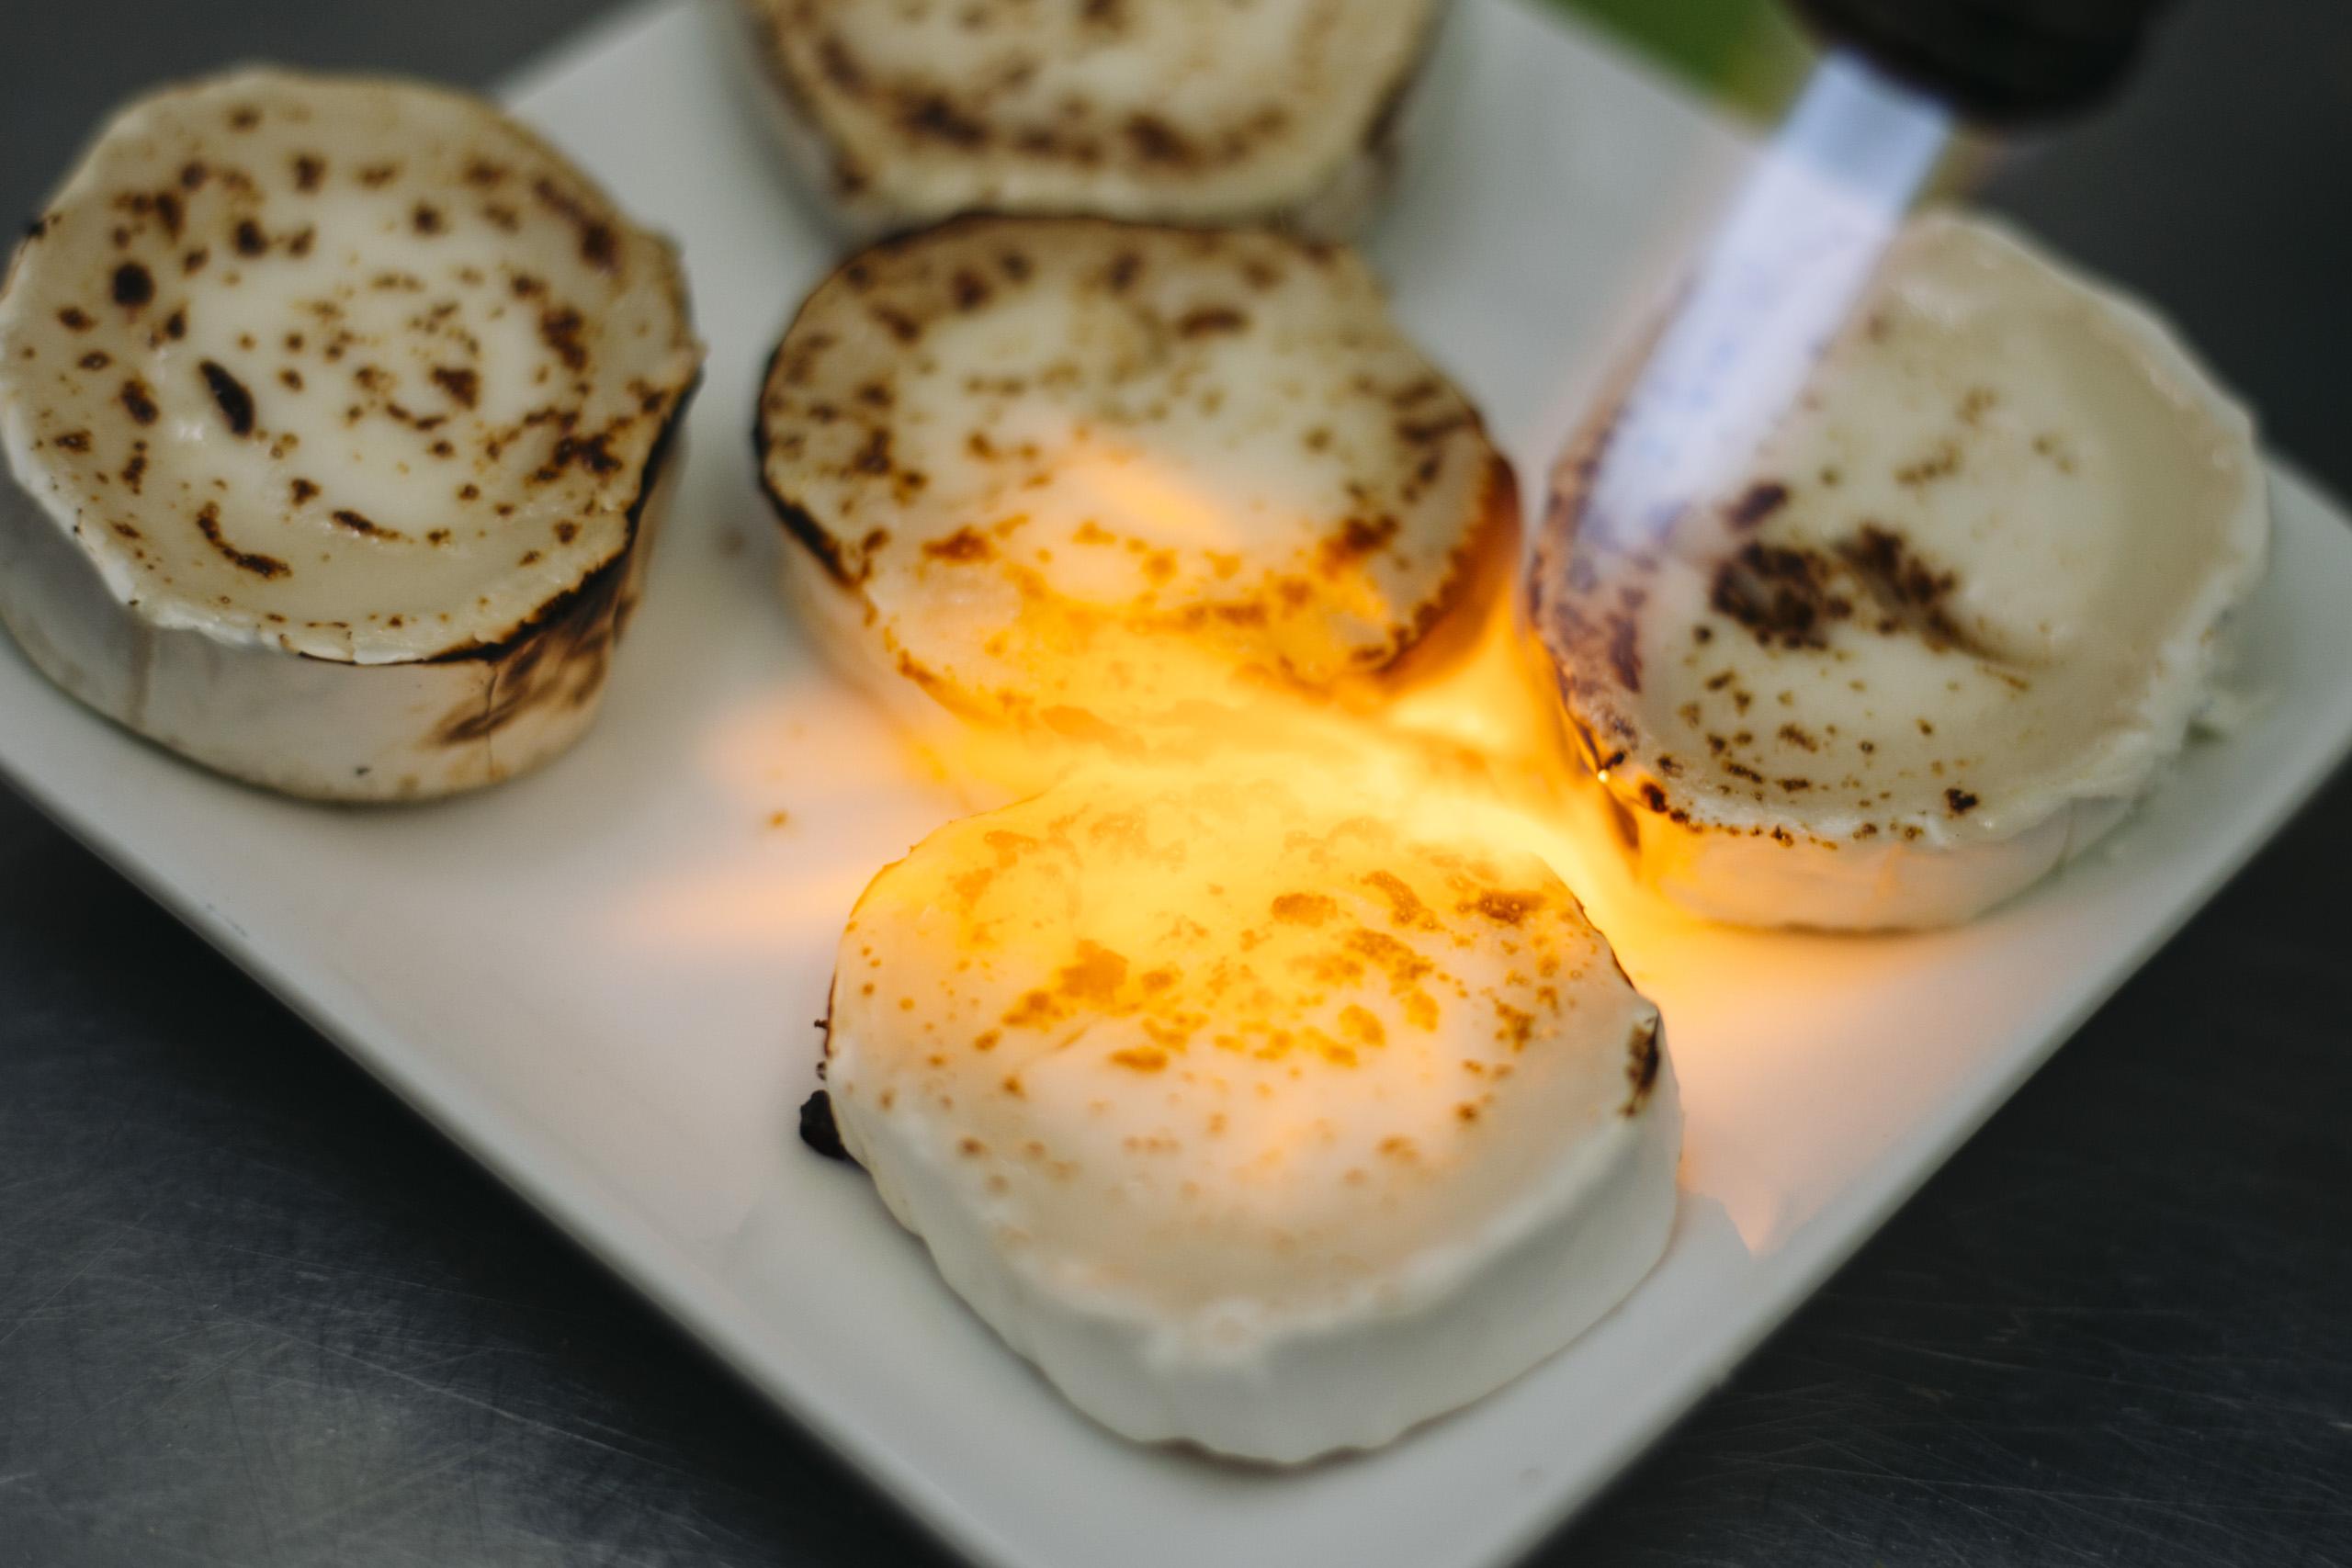 Flambierter Käse